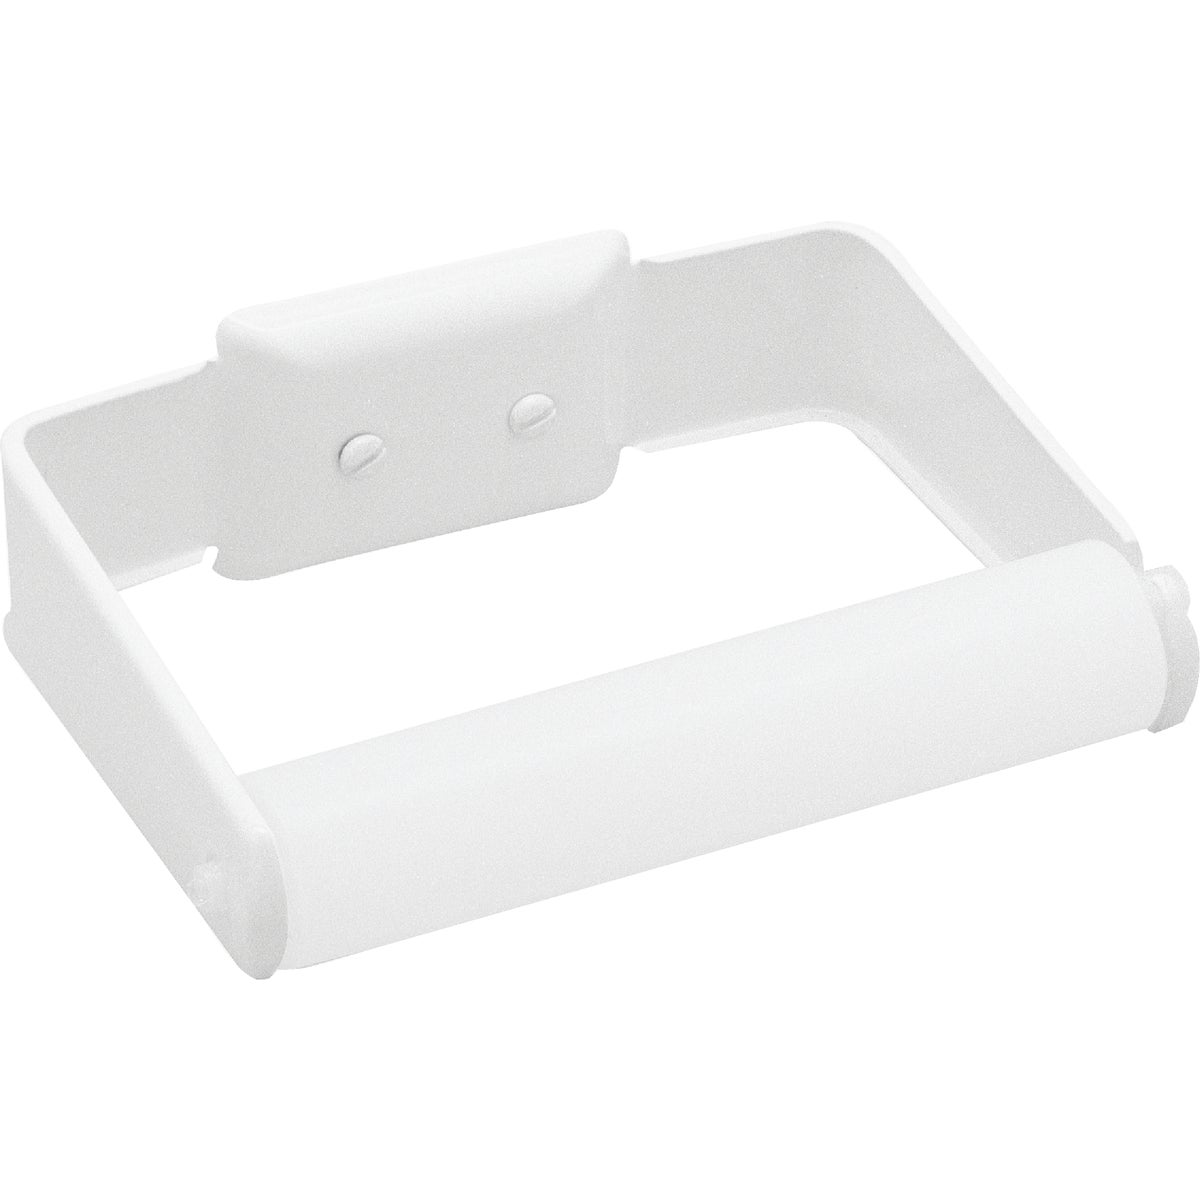 Decko Bath WHT PAPER HOLDER 48890